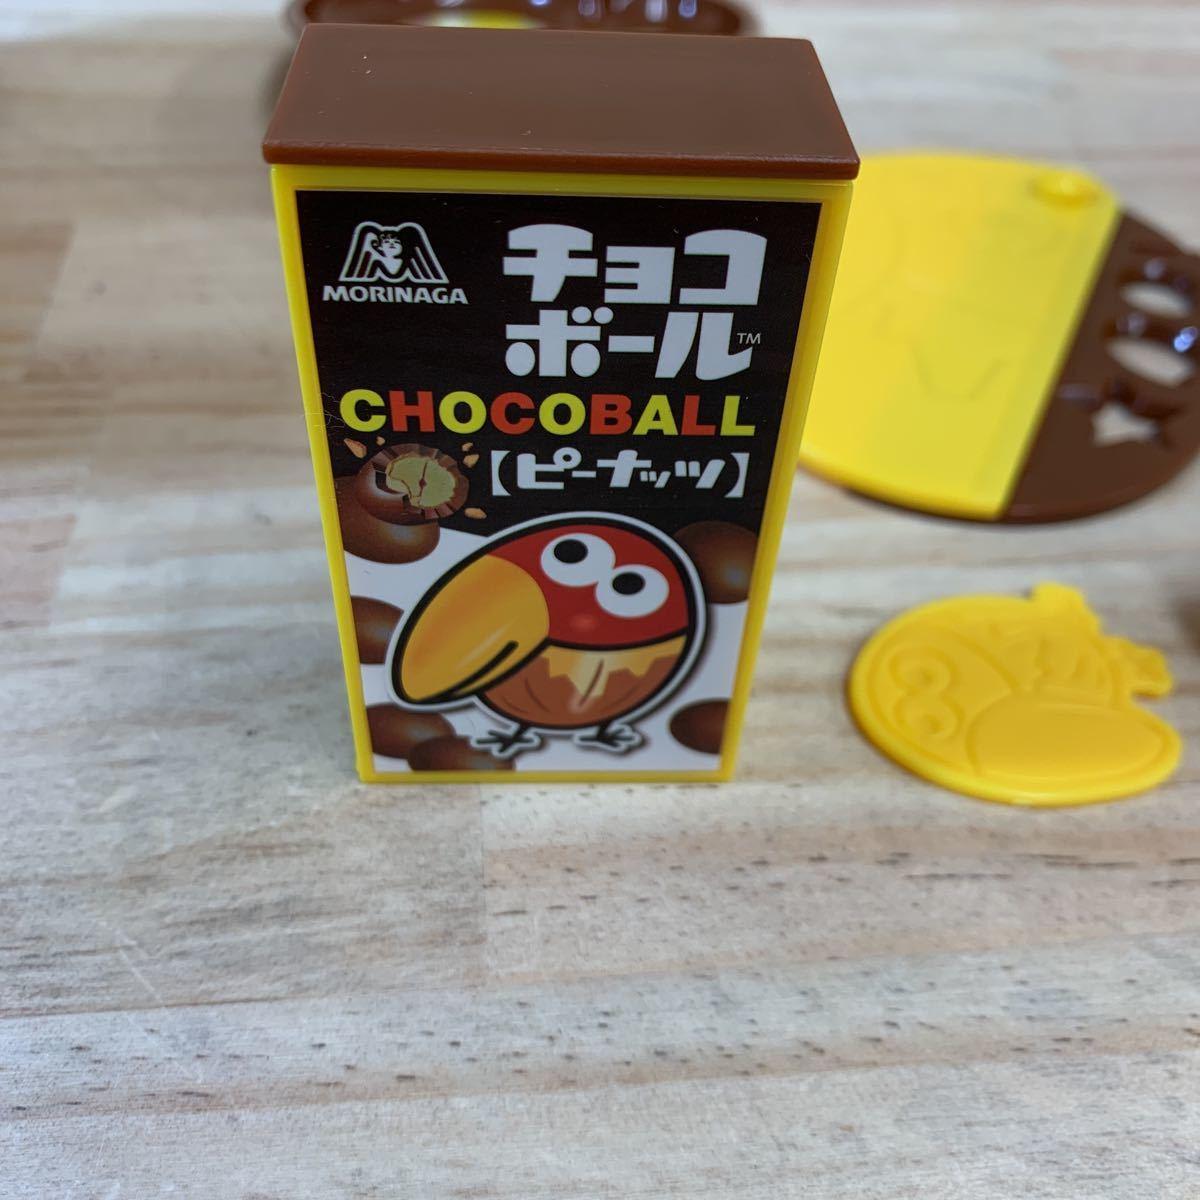 4N8728-5 しゃべる 金のキョロちゃん缶 森永チョコボール おもちゃのカンヅメ_画像8